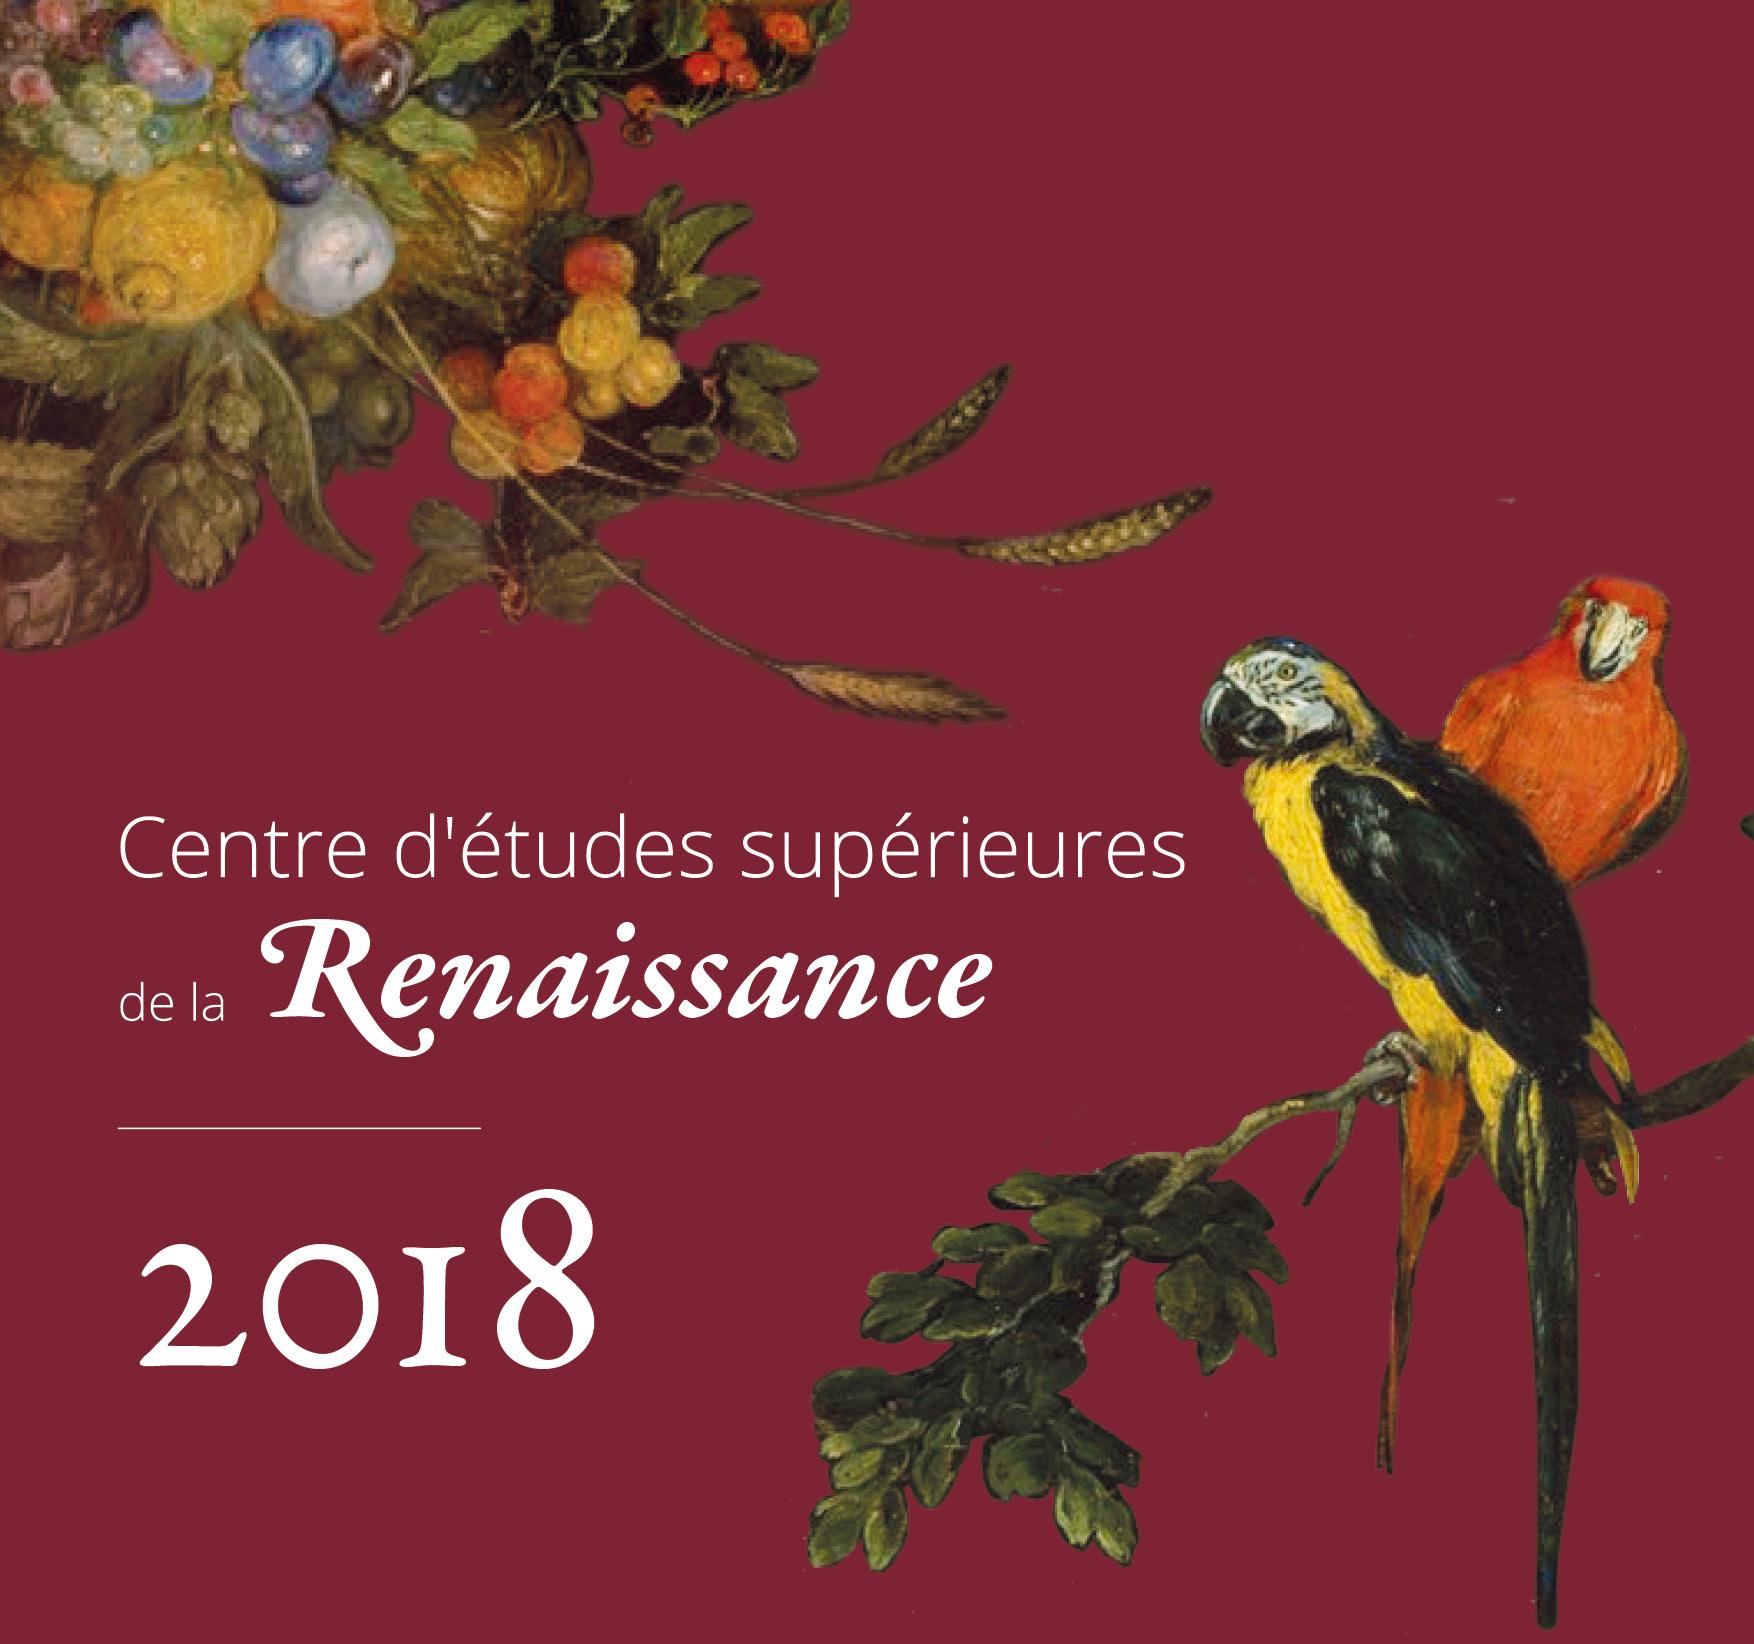 Visuel - Calendrier des manifestation CESR 2018